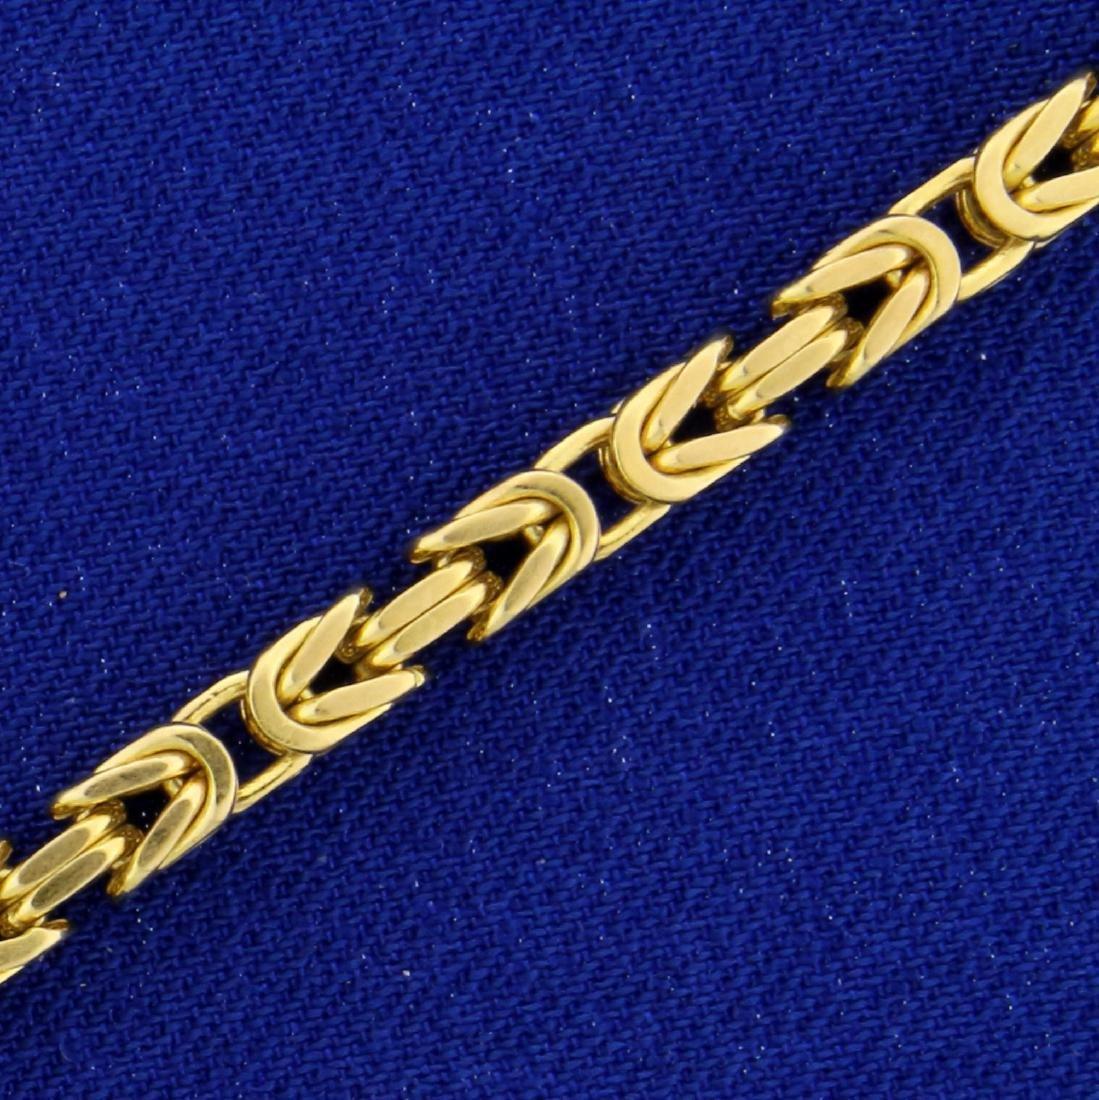 8 Inch Byzentine Link Bracelet in 14K Yellow Gold - 2